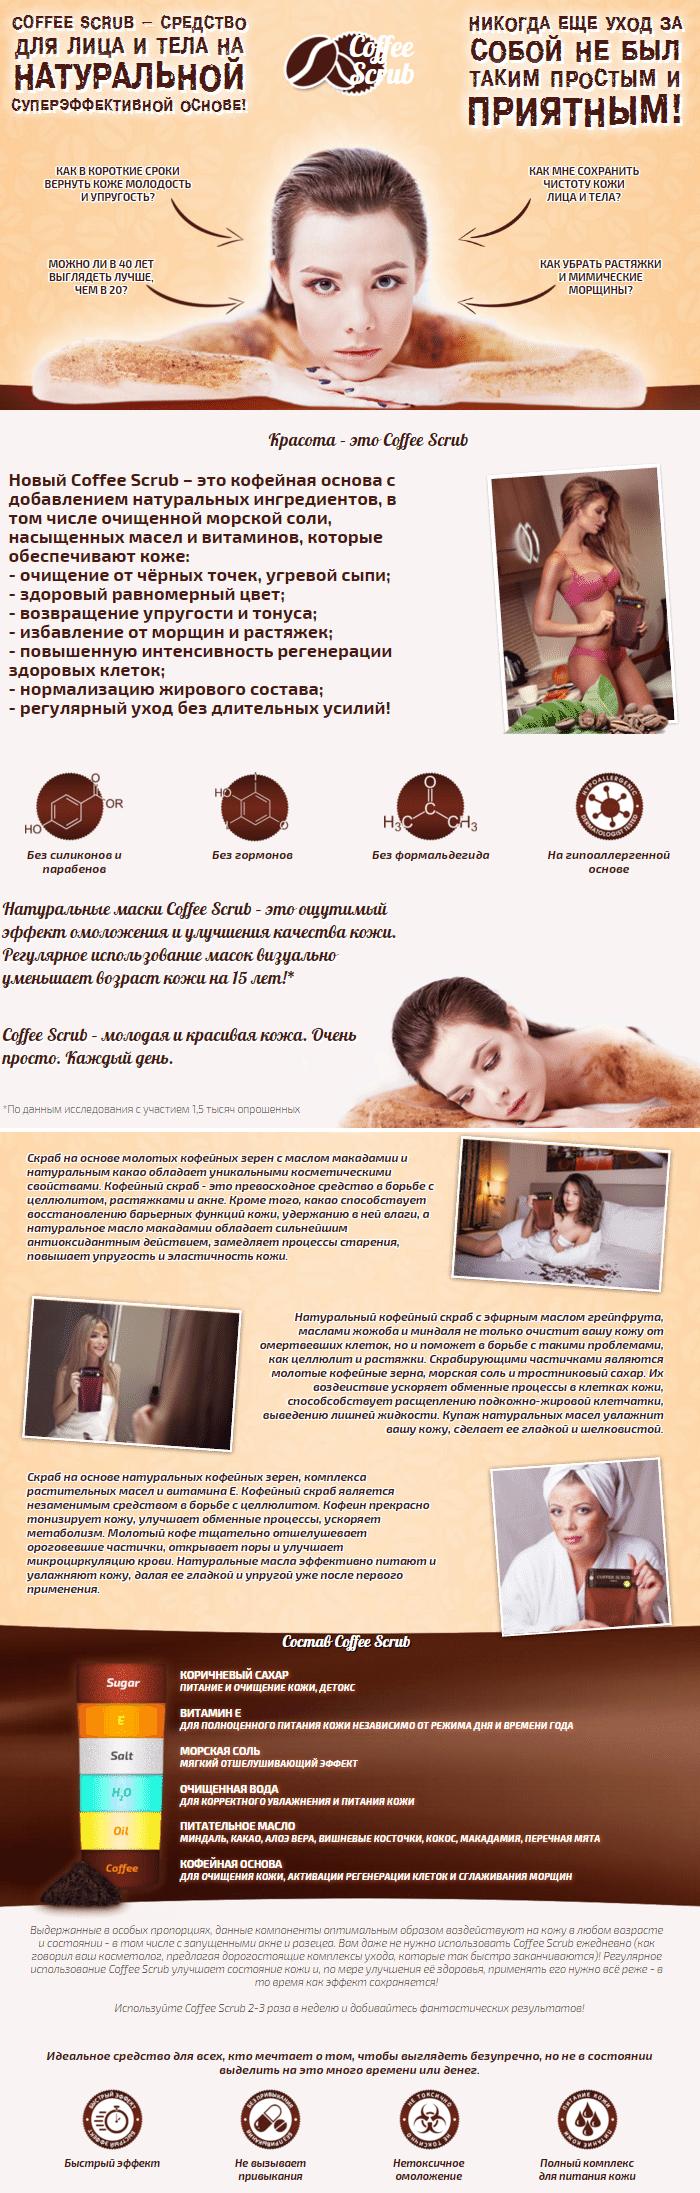 Скраб для тела Coffee Scrub (Savonry)